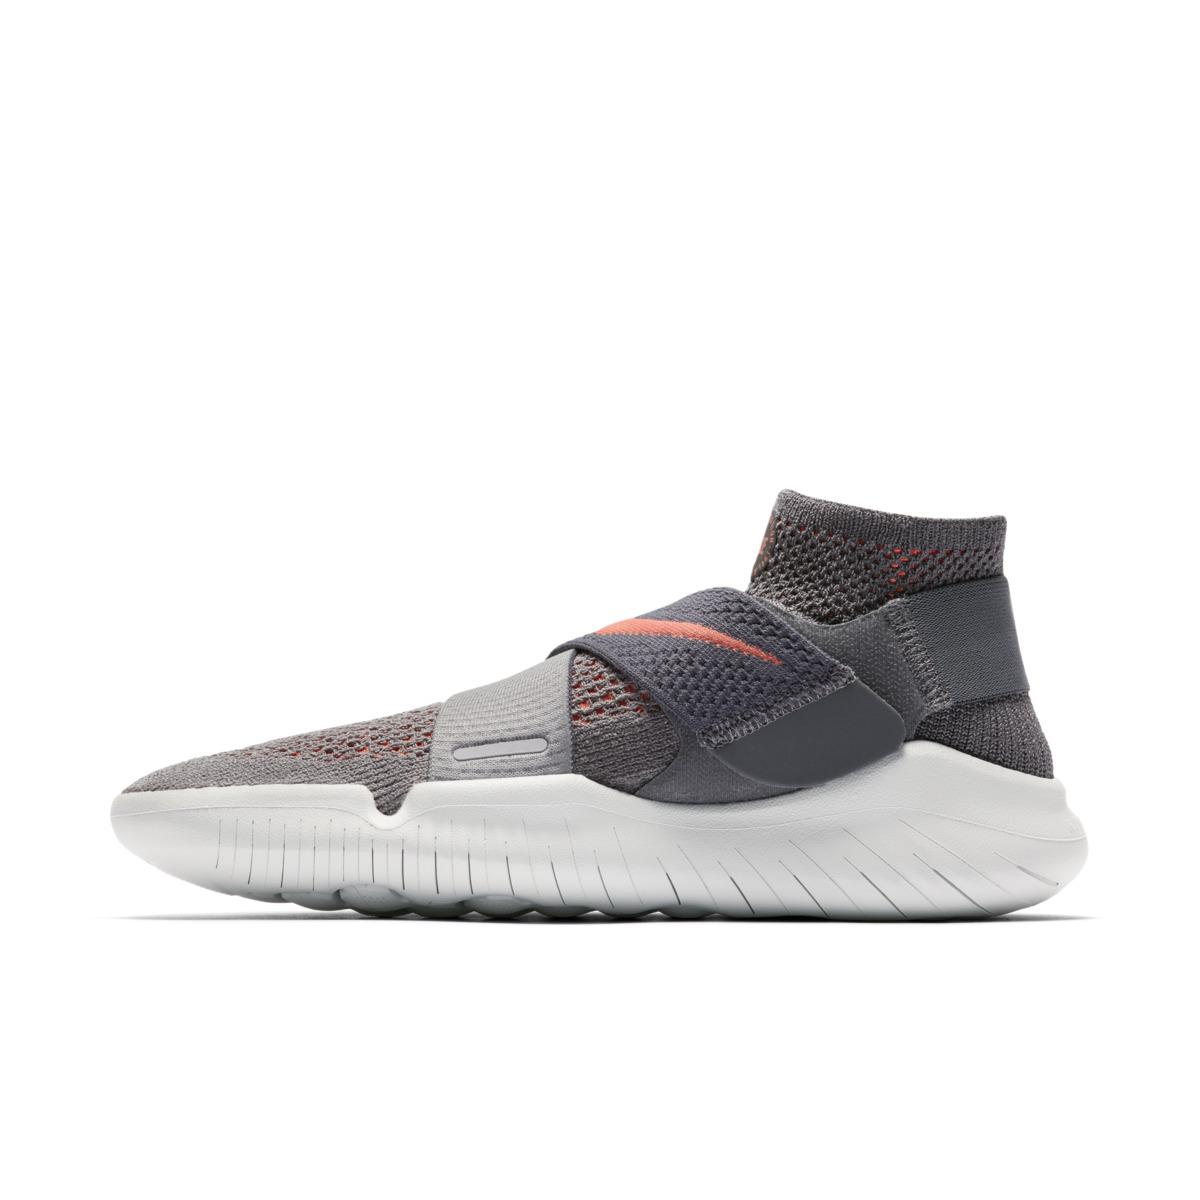 90cff8b28465 Nike - Gray Free Rn Motion Flyknit 2018 Running Shoes - Lyst. View  fullscreen